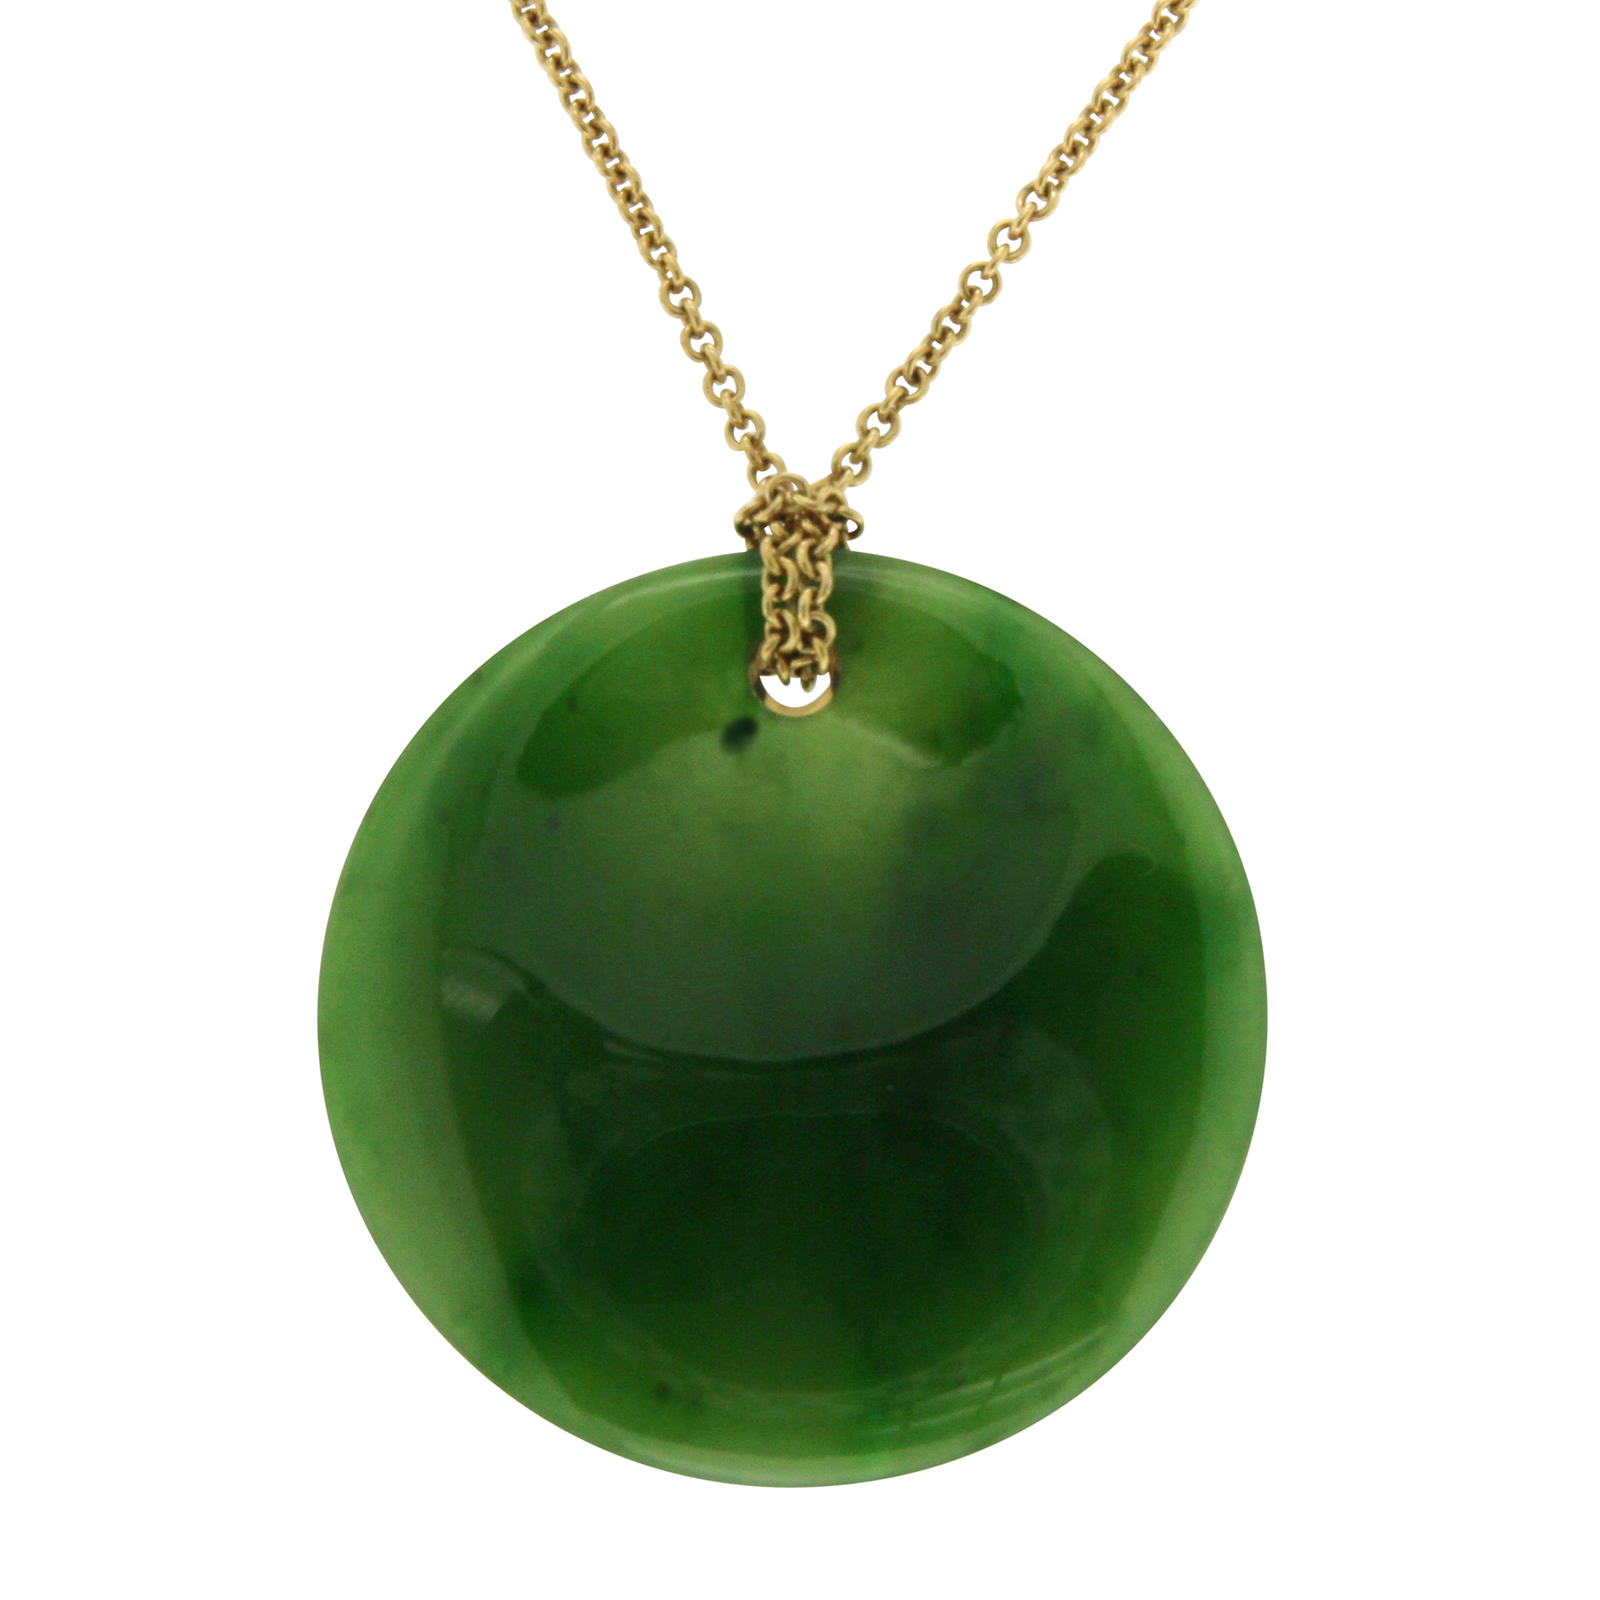 9403808be4cf3 Tiffany & Co. Elsa Peretti 18K Yellow Gold & Round Jade Pendant Necklace